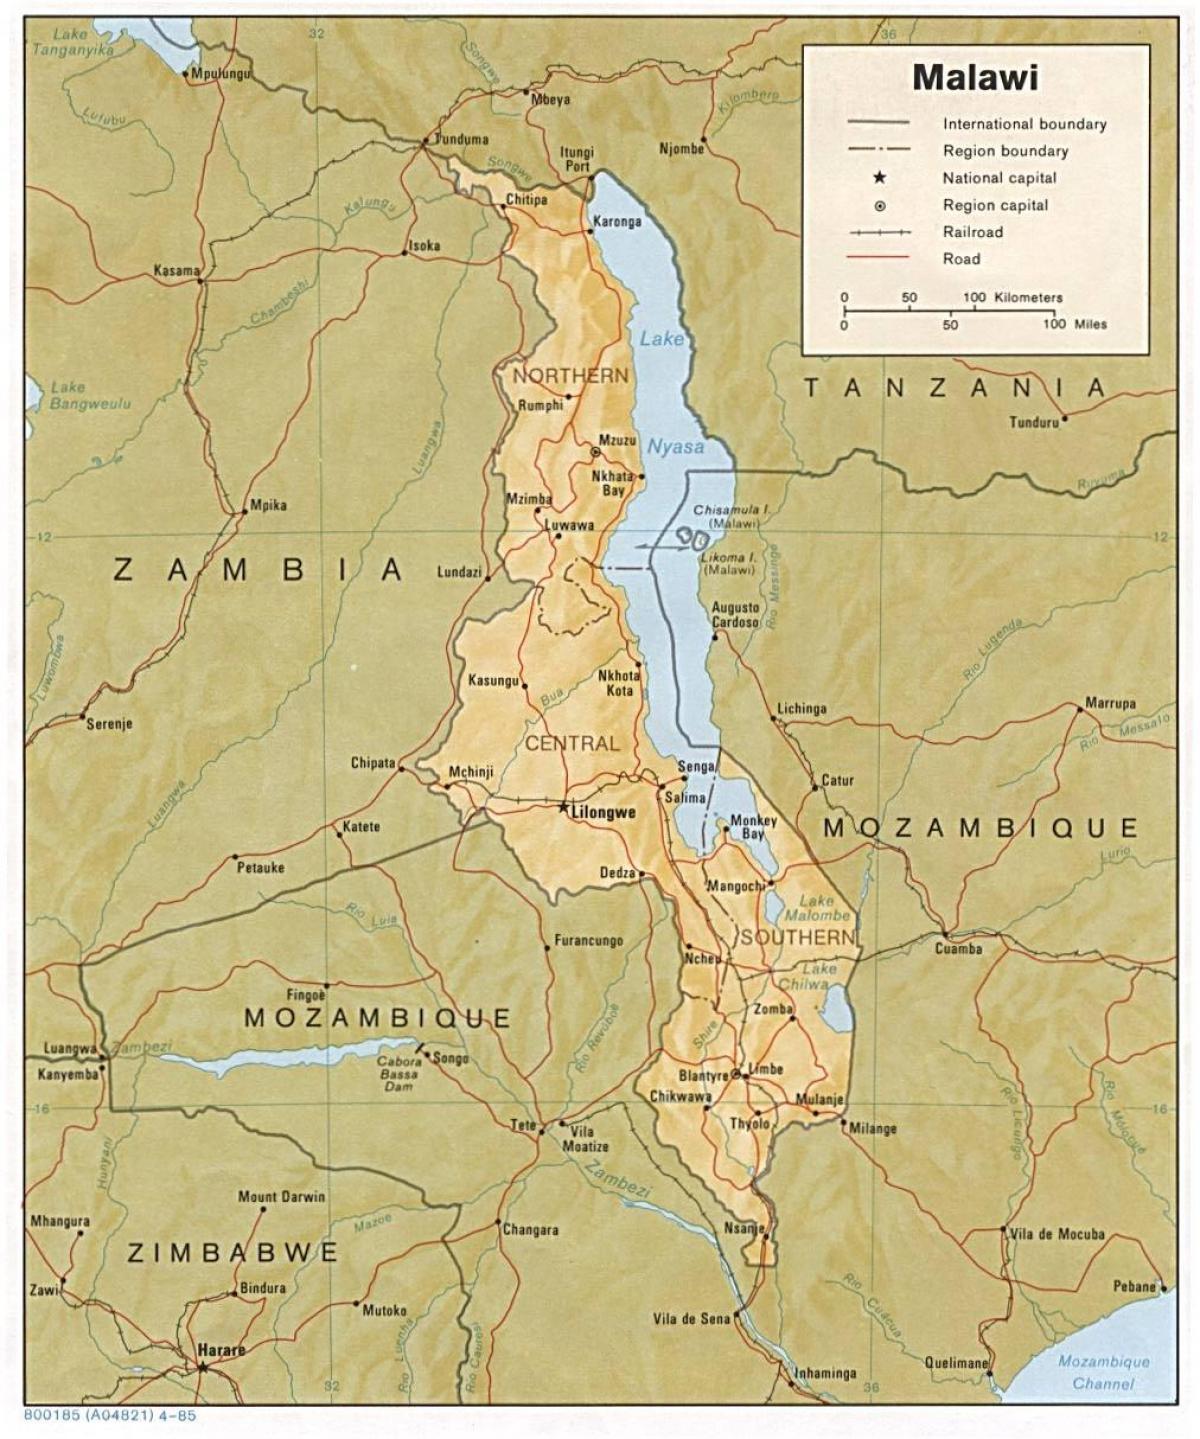 Lake Malawi Africa Map.Lake Malawi Map Lake Malawi On Map Eastern Africa Africa